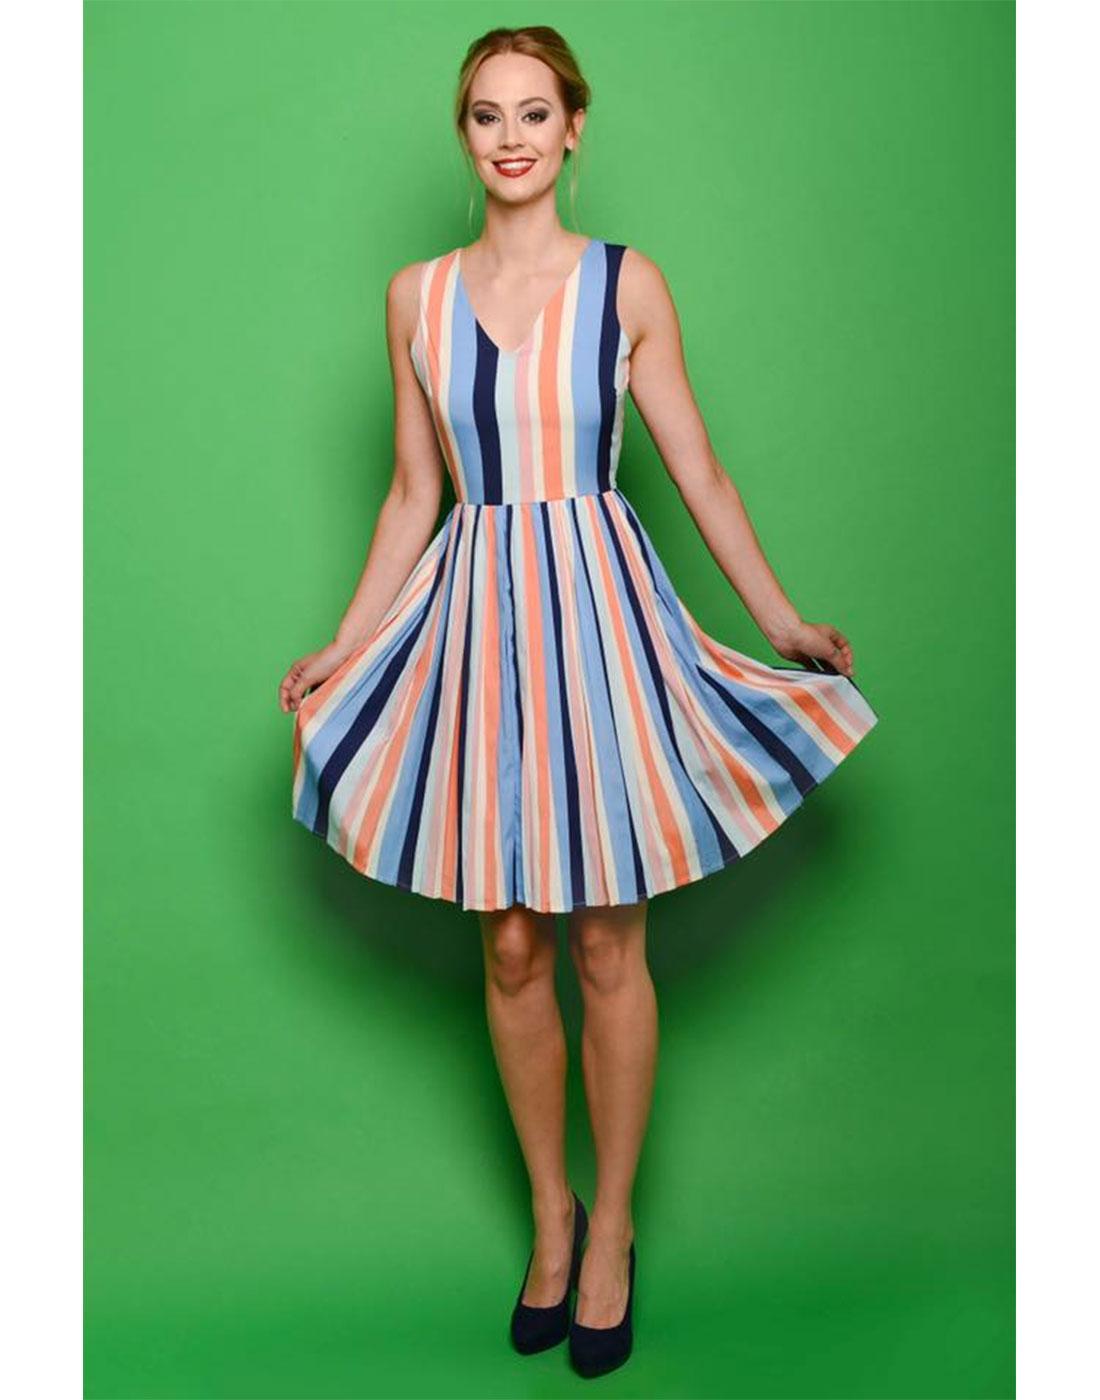 FEVER Retro 1950s Vintage Multi Striped Prom Dress